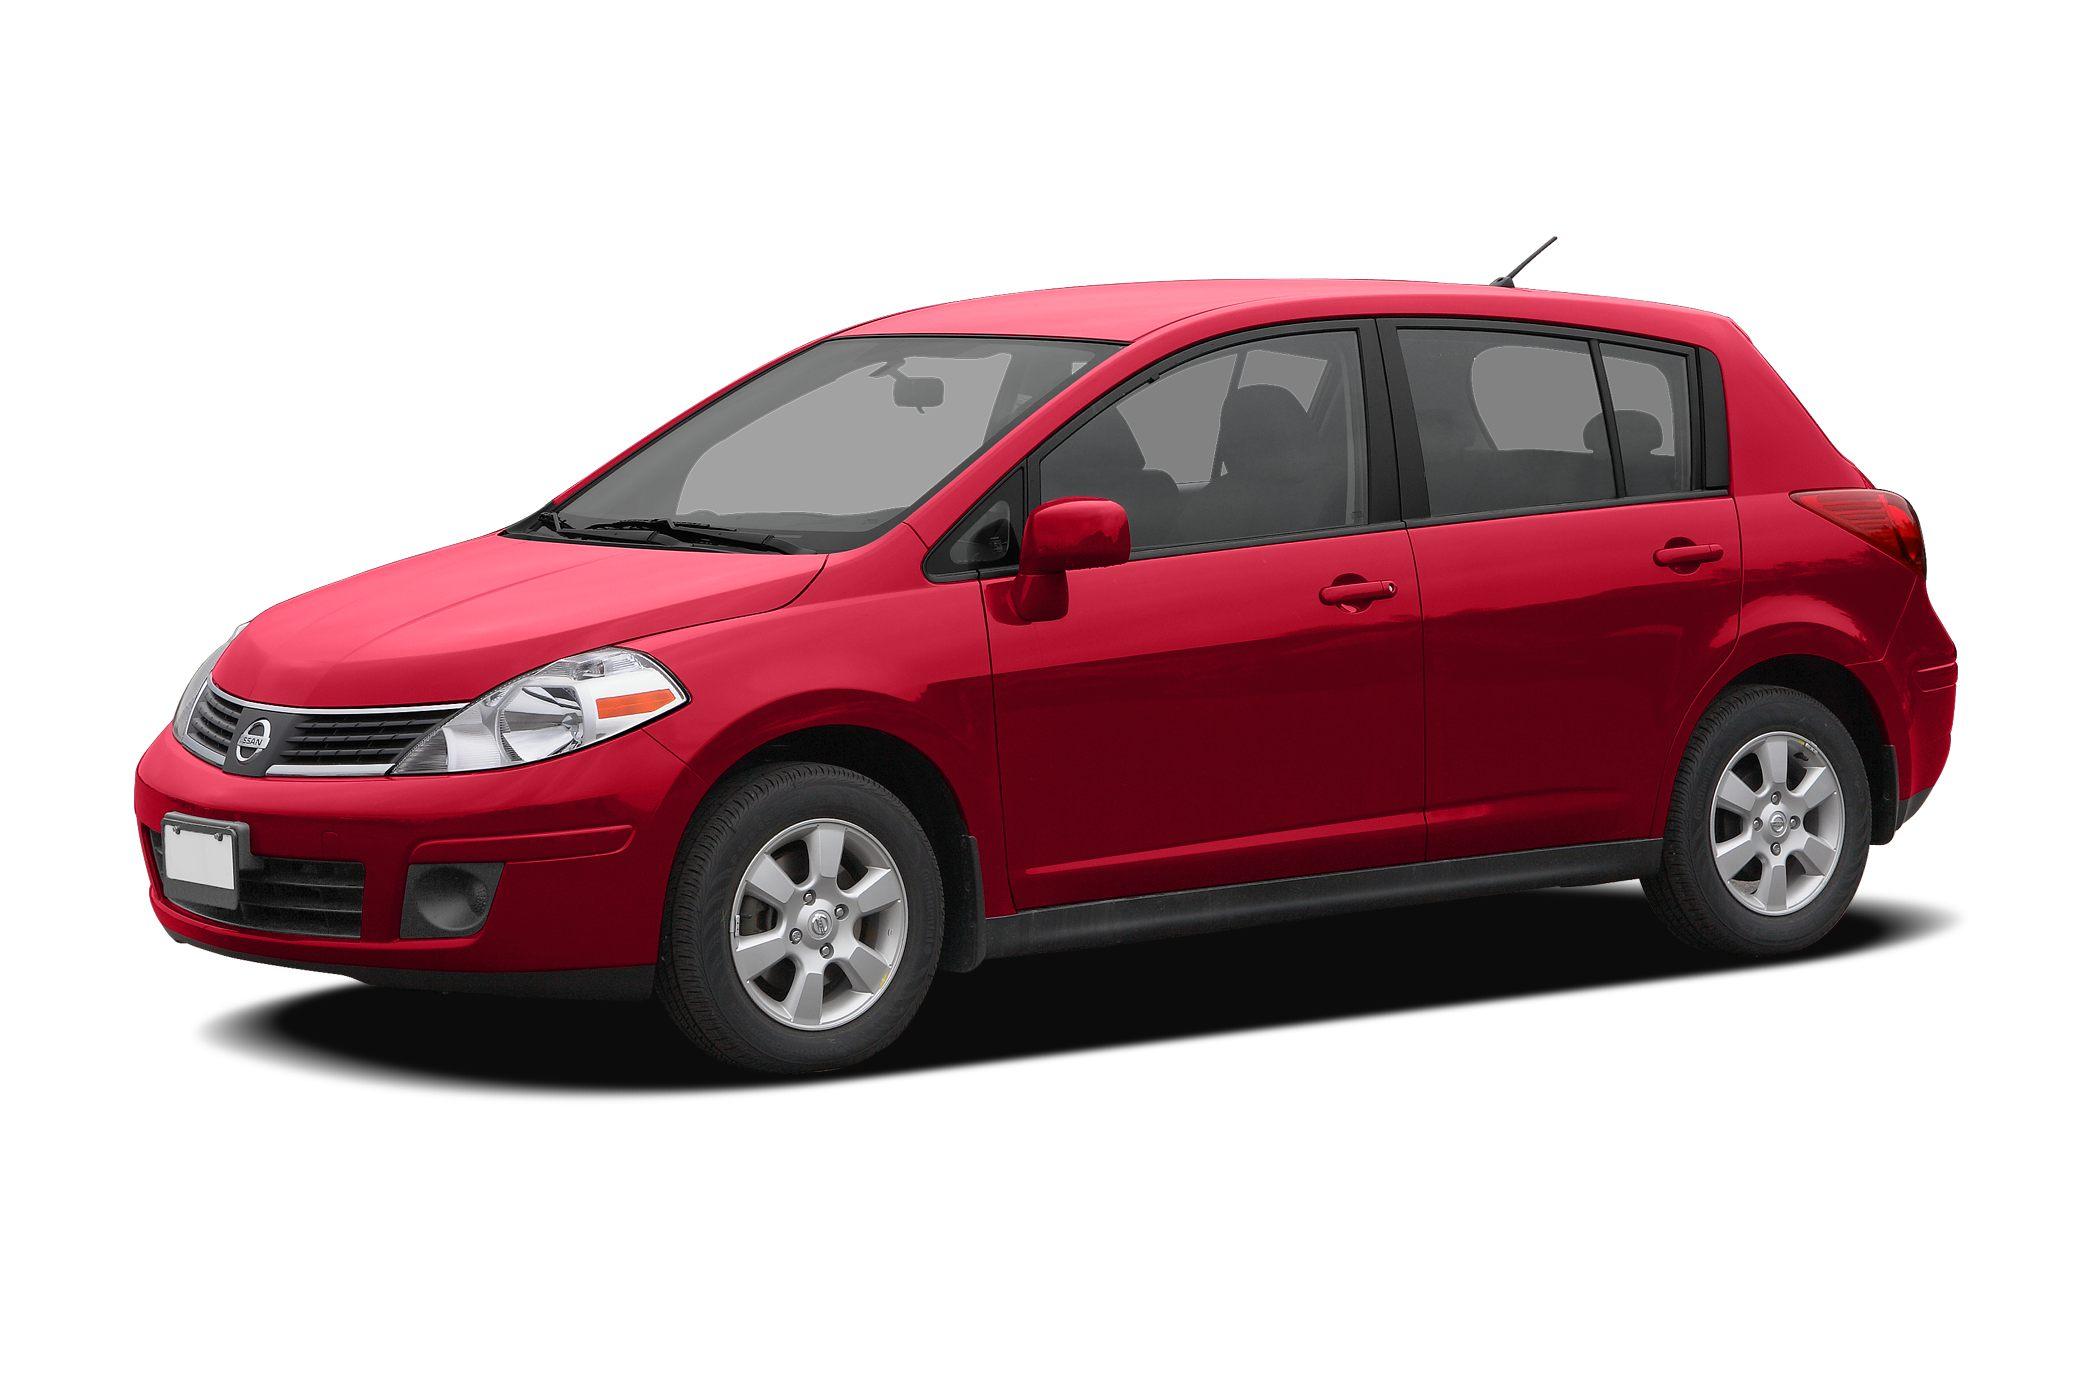 2008 Nissan Versa  Miles 73432Color Gray Stock 17267R VIN 3N1BC13E08L372484